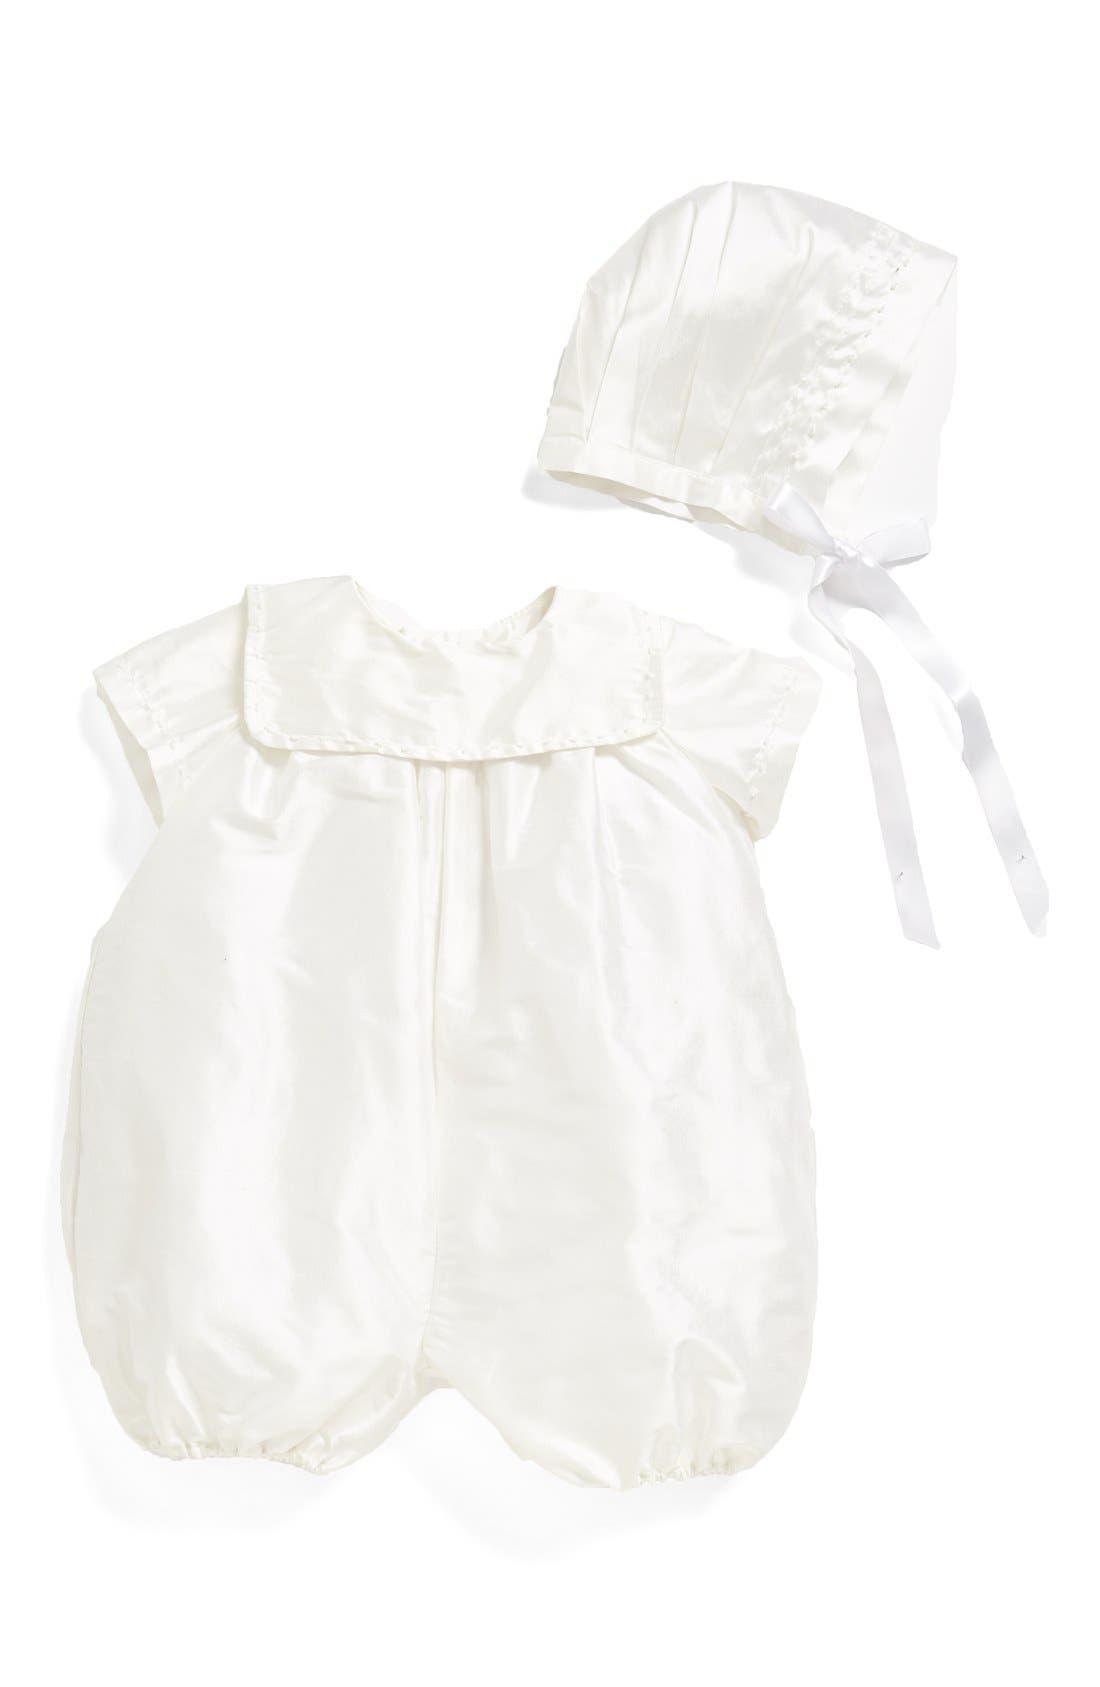 ISABEL GARRETON 'Charming' Silk Romper & Bonnet